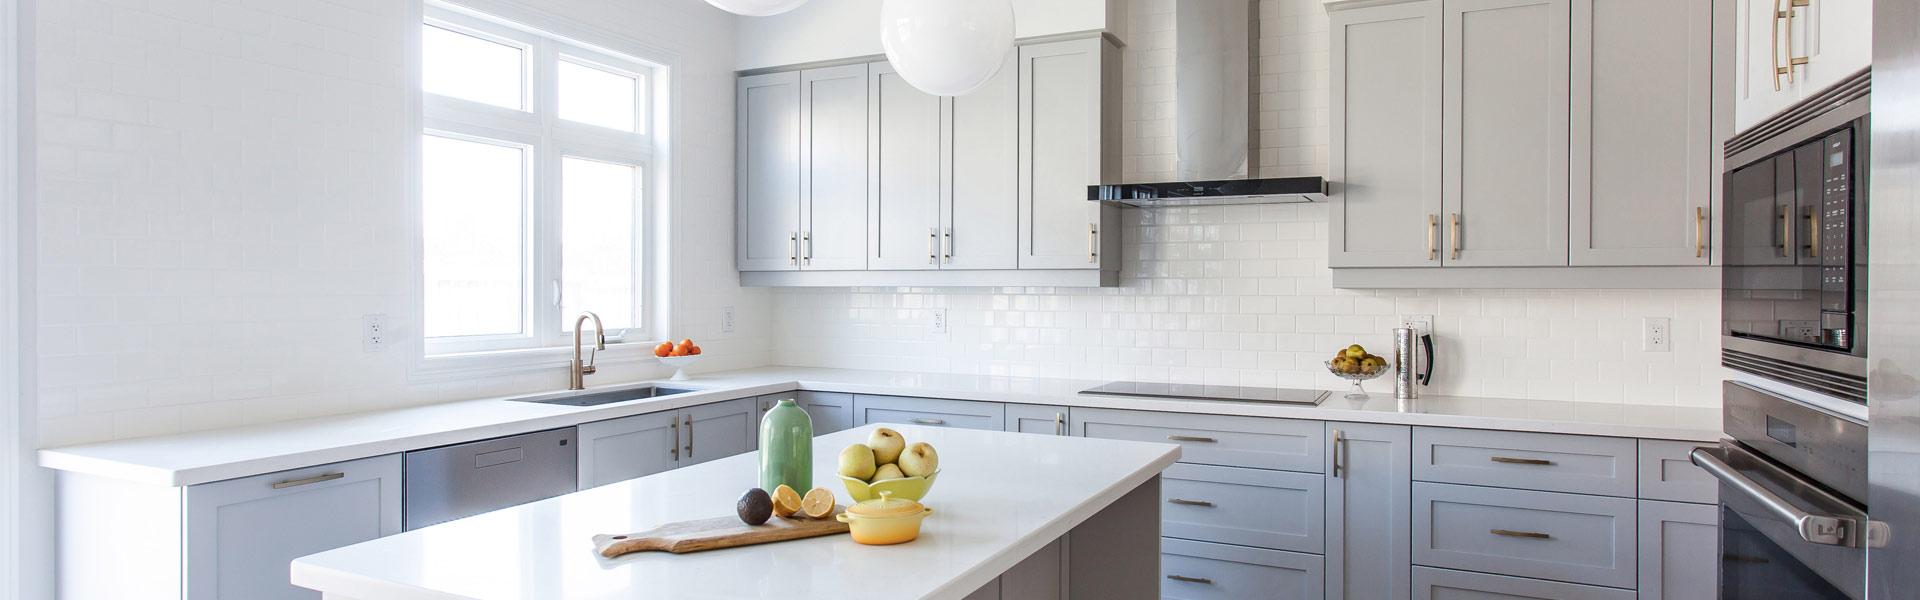 Affordable Kitchen Cabinets San Go